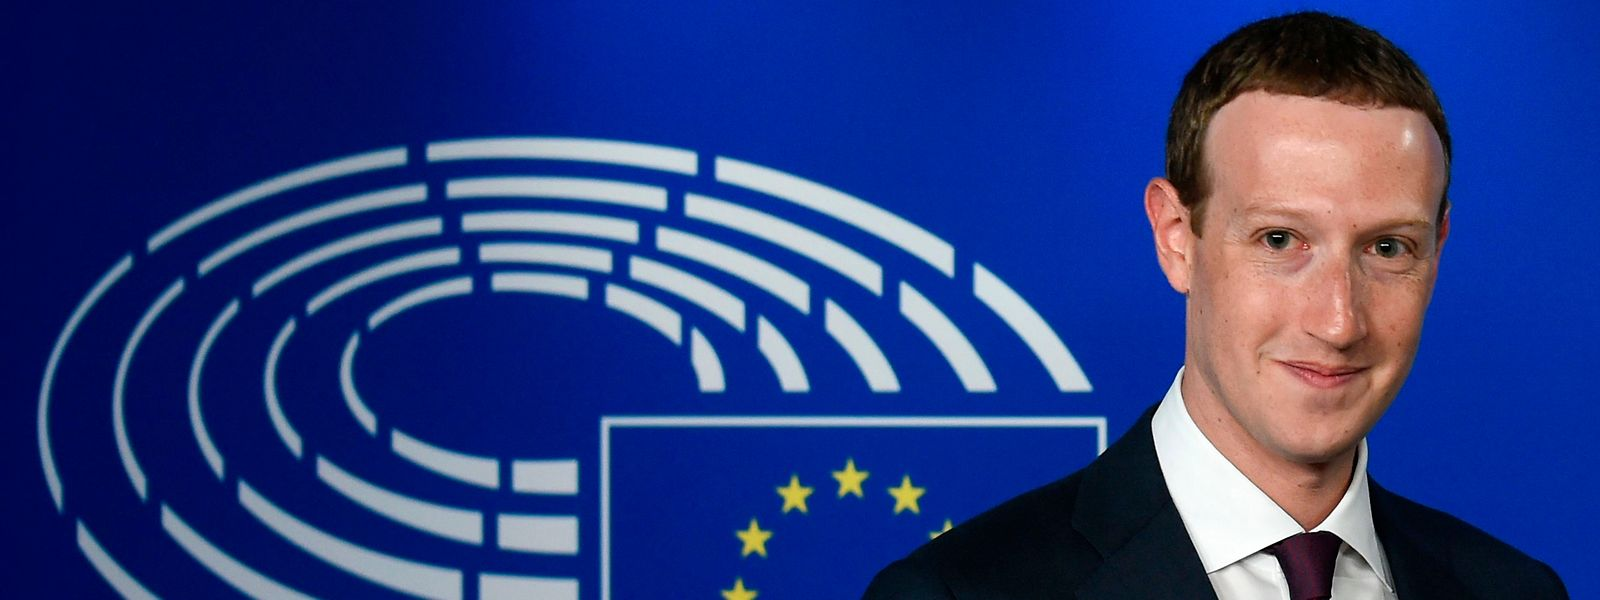 Mark Zuckerberg bei seiner Ankunft im EU-Parlament.